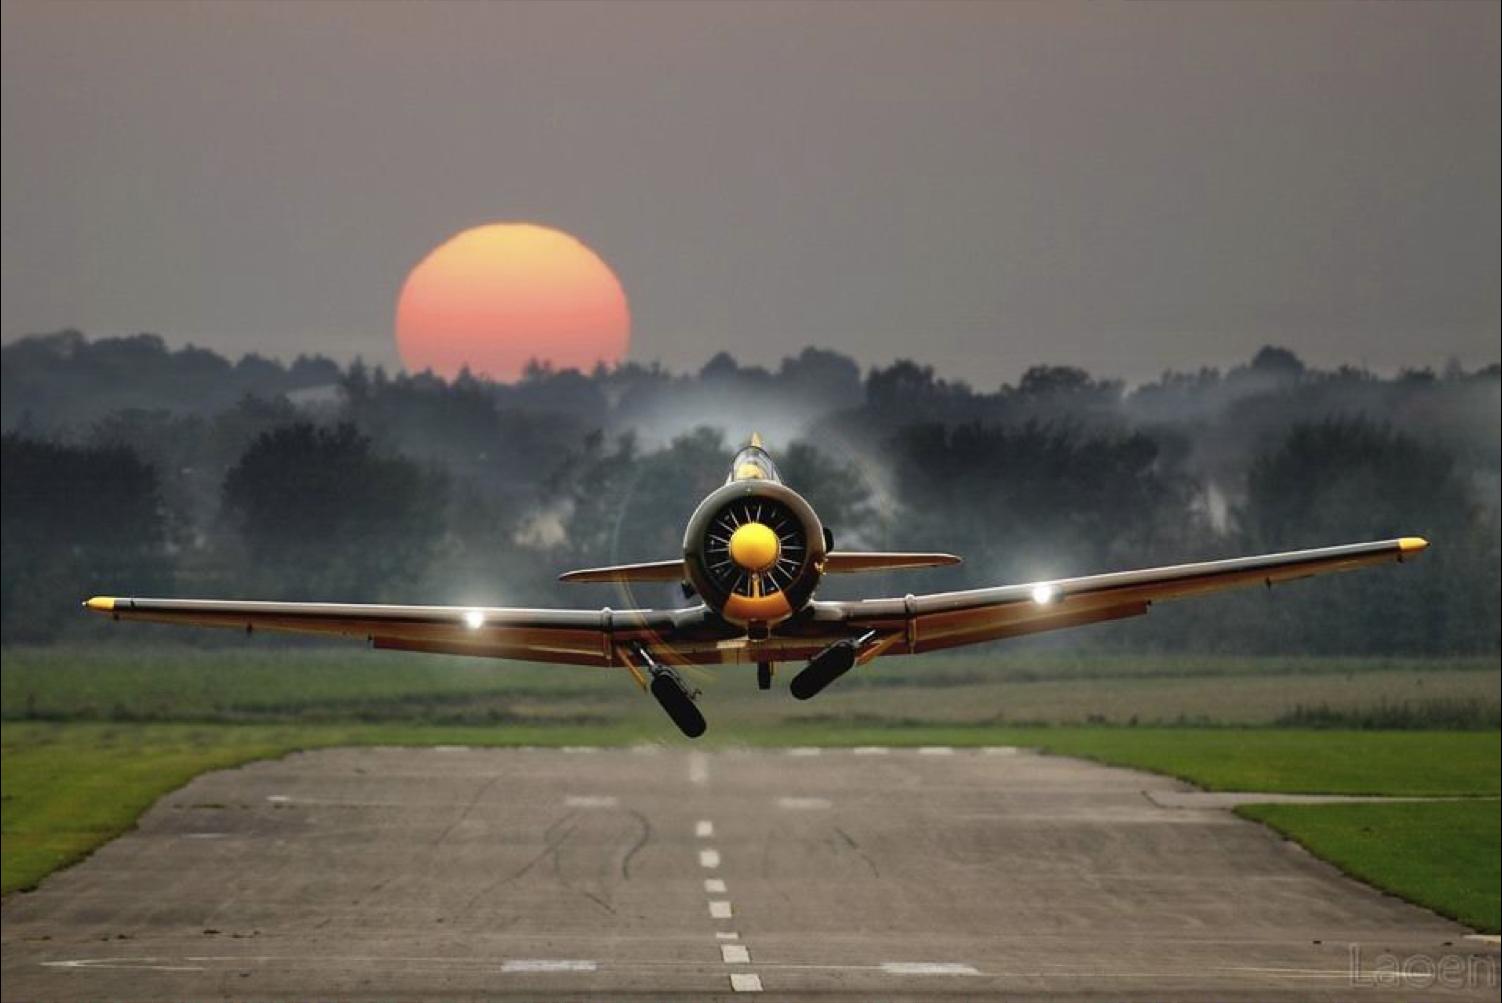 aircraft take off runway planes vehicles propeller plane HD Wallpaper 1502x1003